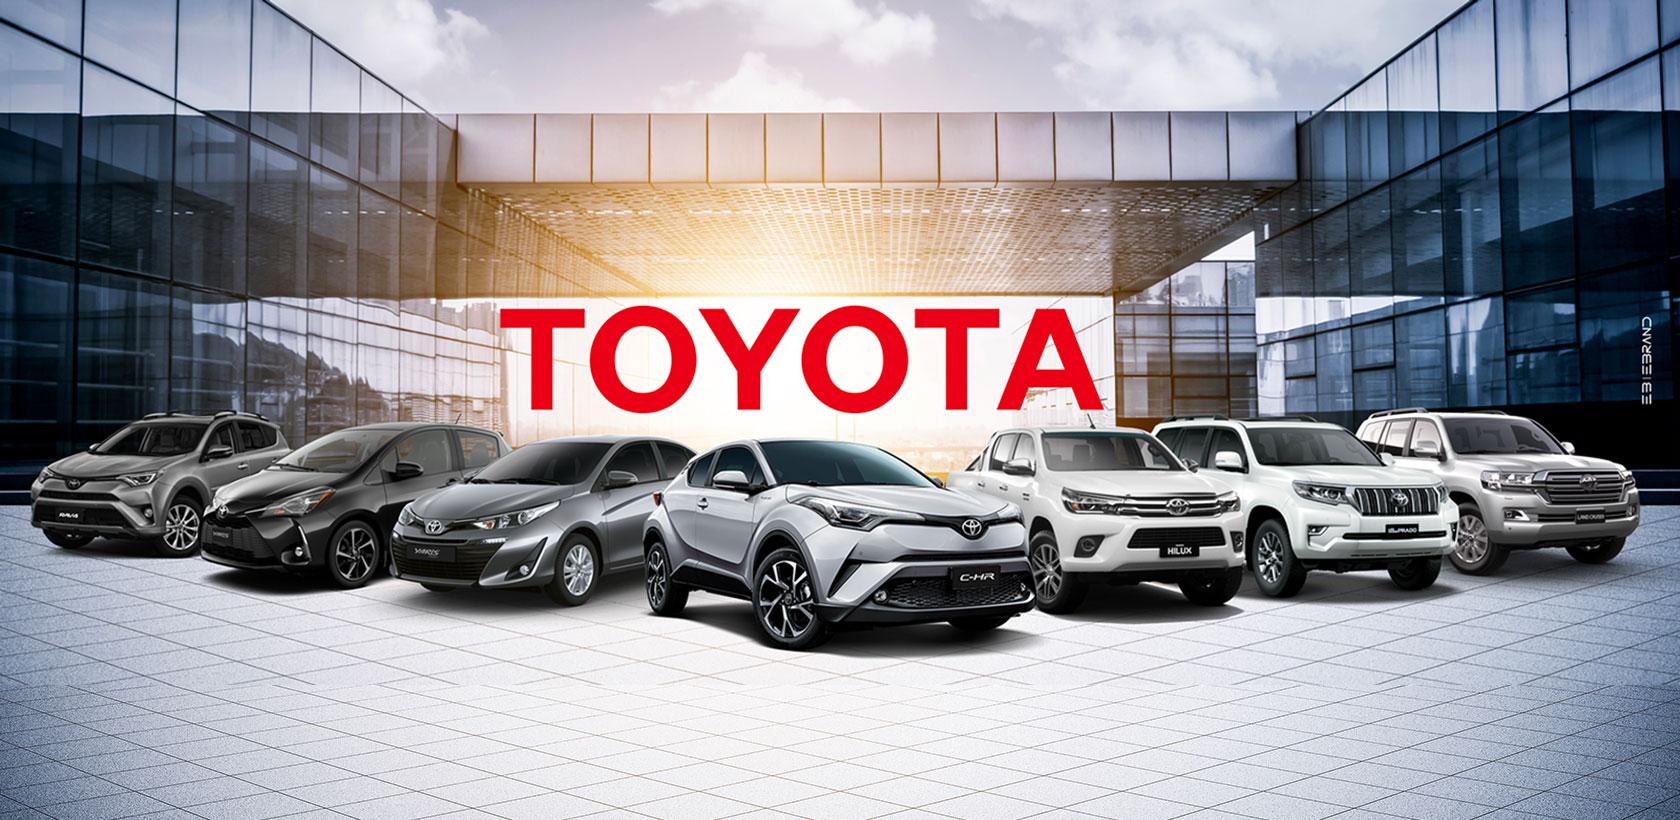 Toyota leader des ventes VP en Janvier 2018